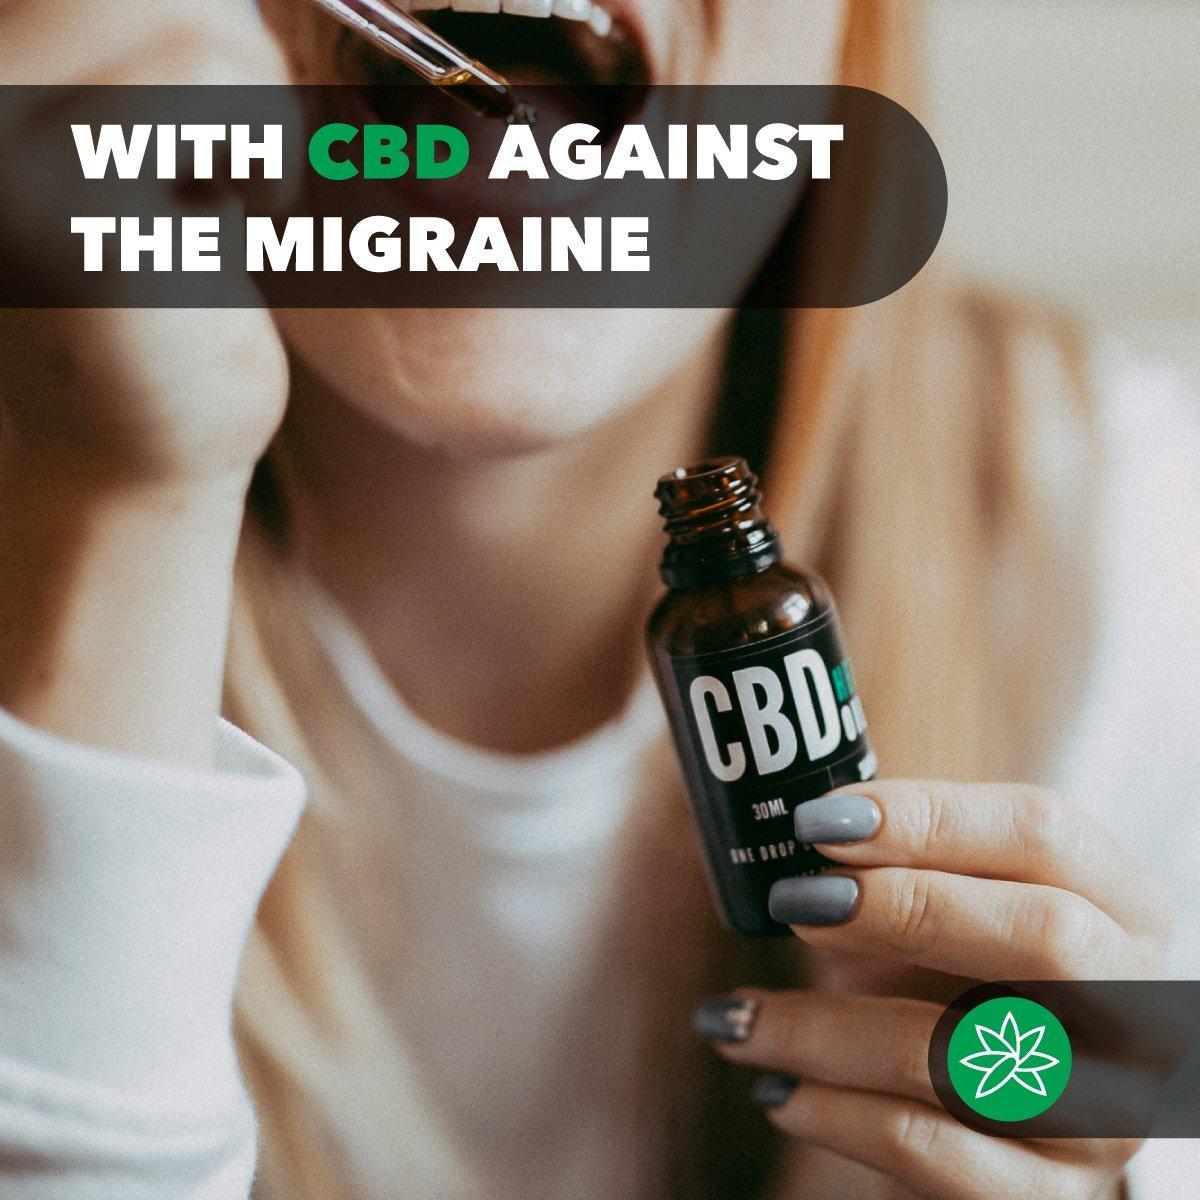 With CBD against the migraine